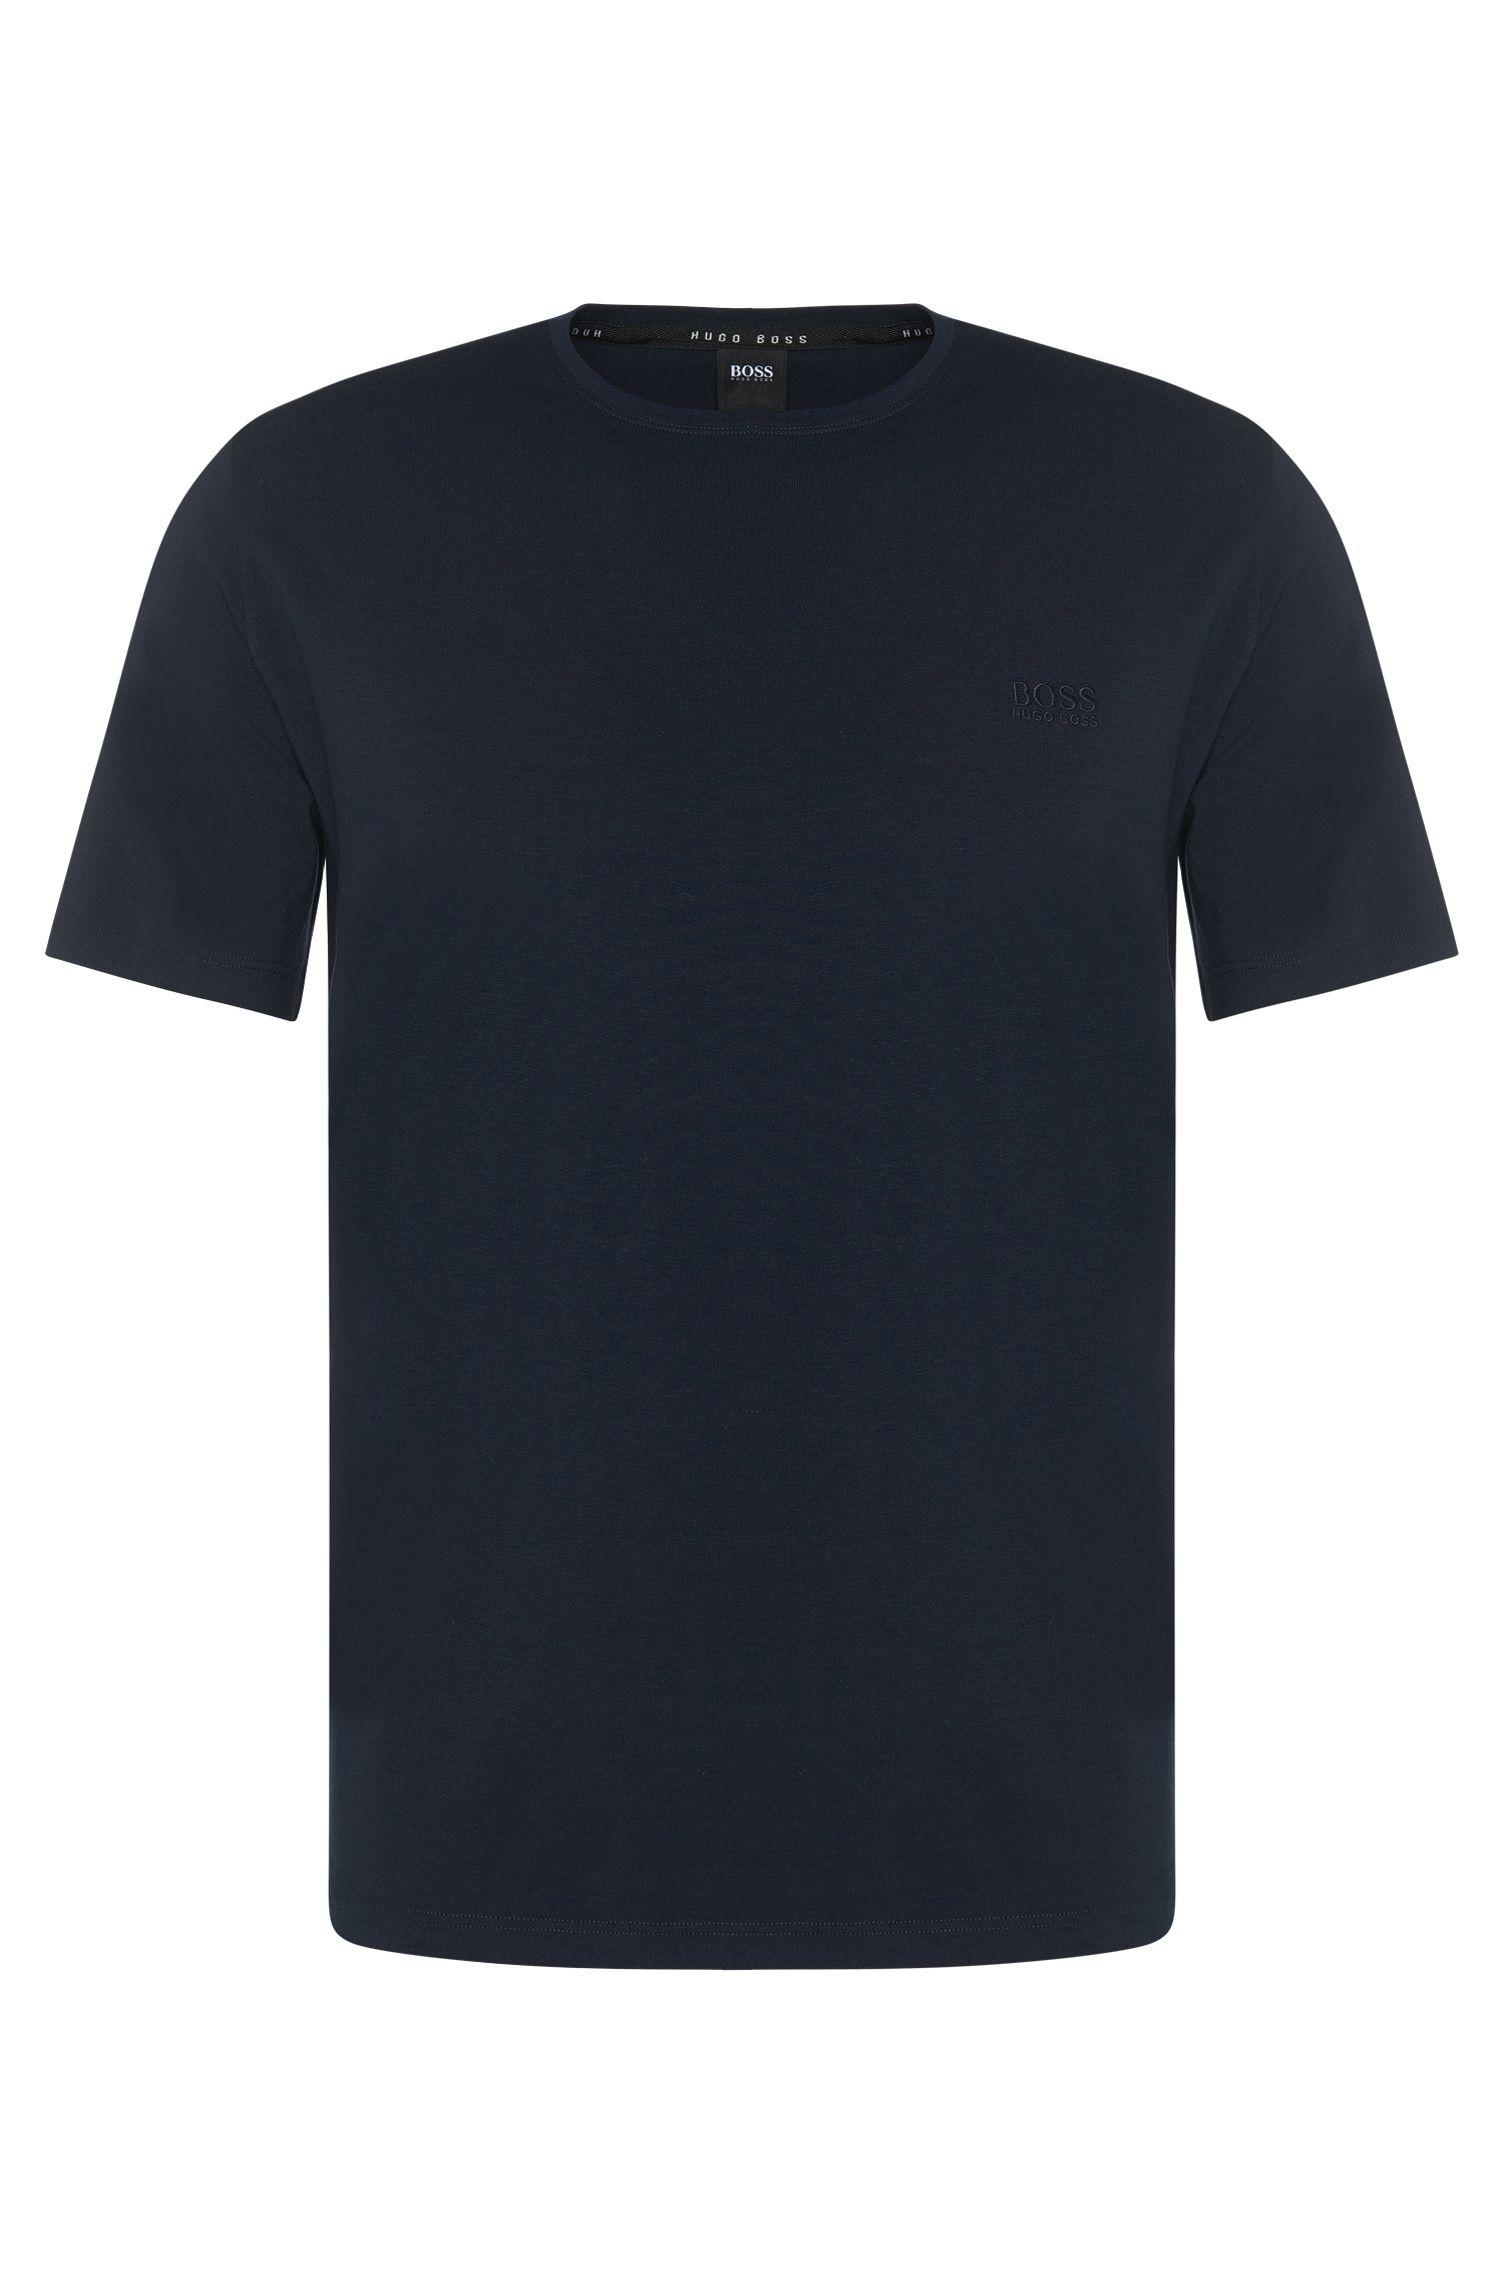 Regular-fit loungewear T-shirt in stretch cotton jersey